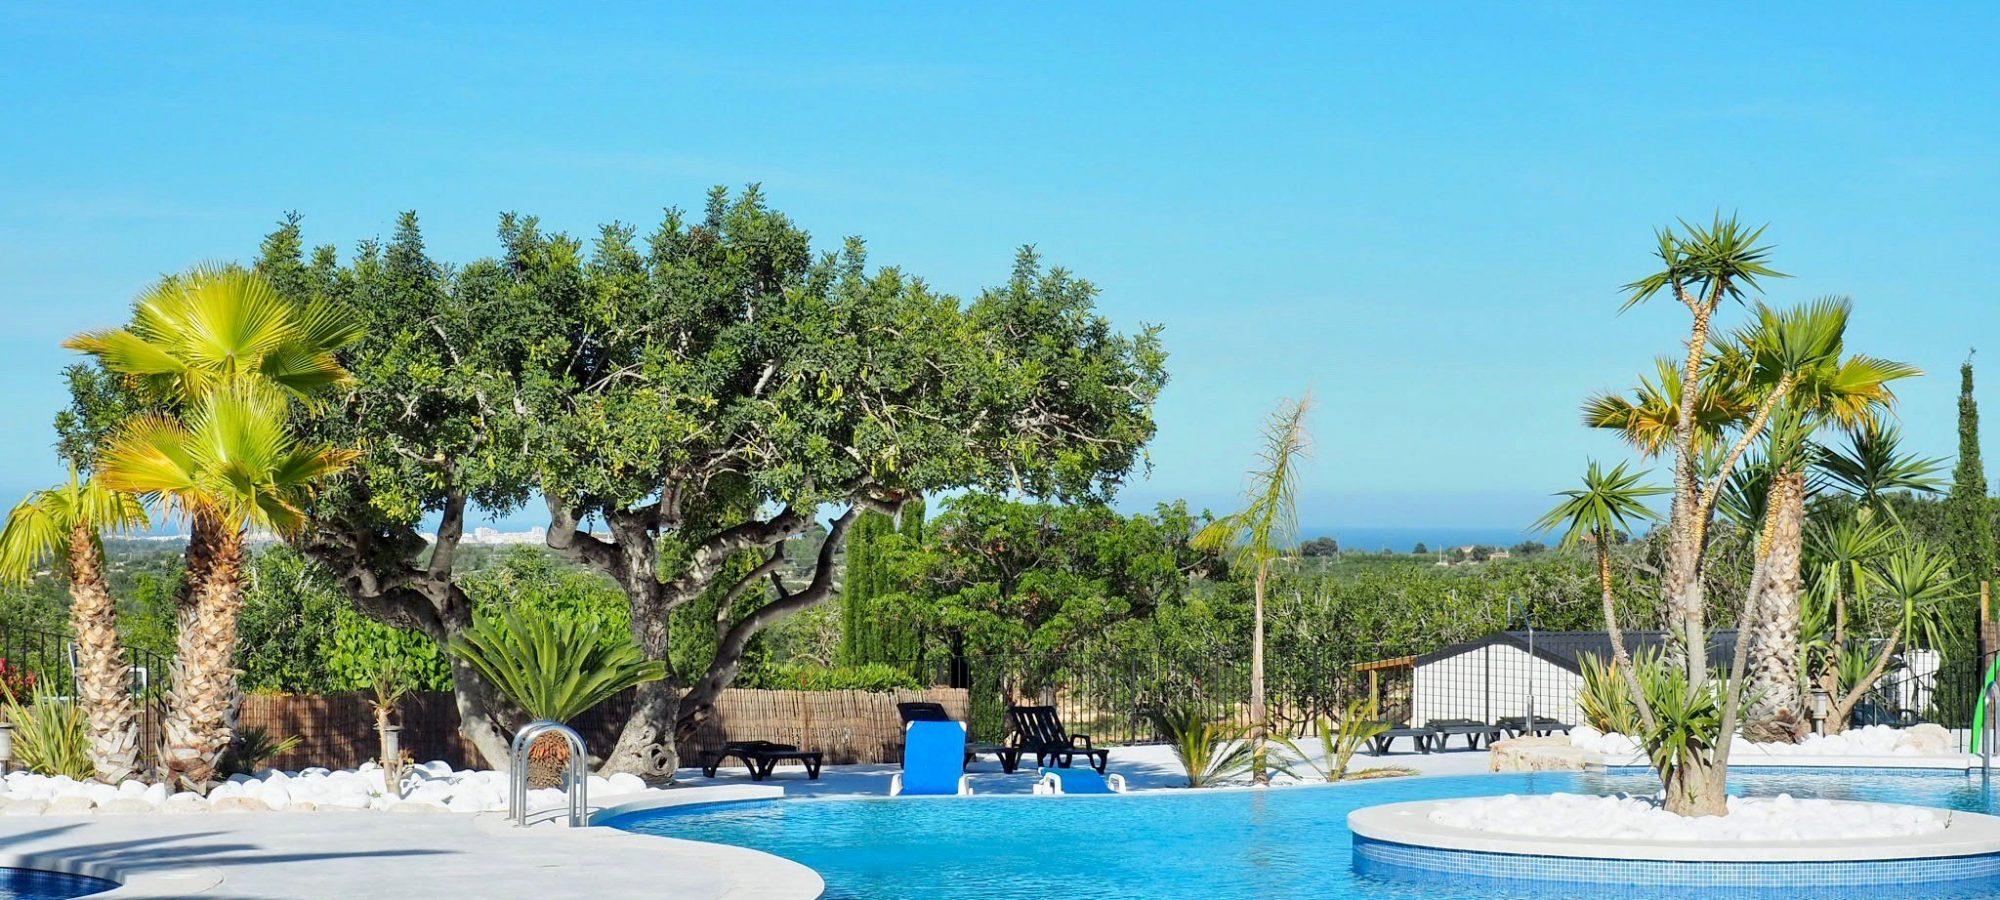 Camping Peniscola | Camping L'orangeraie 3 Étoiles Calig Espagne intérieur Camping Bord De Mer Mediterranee Avec Piscine